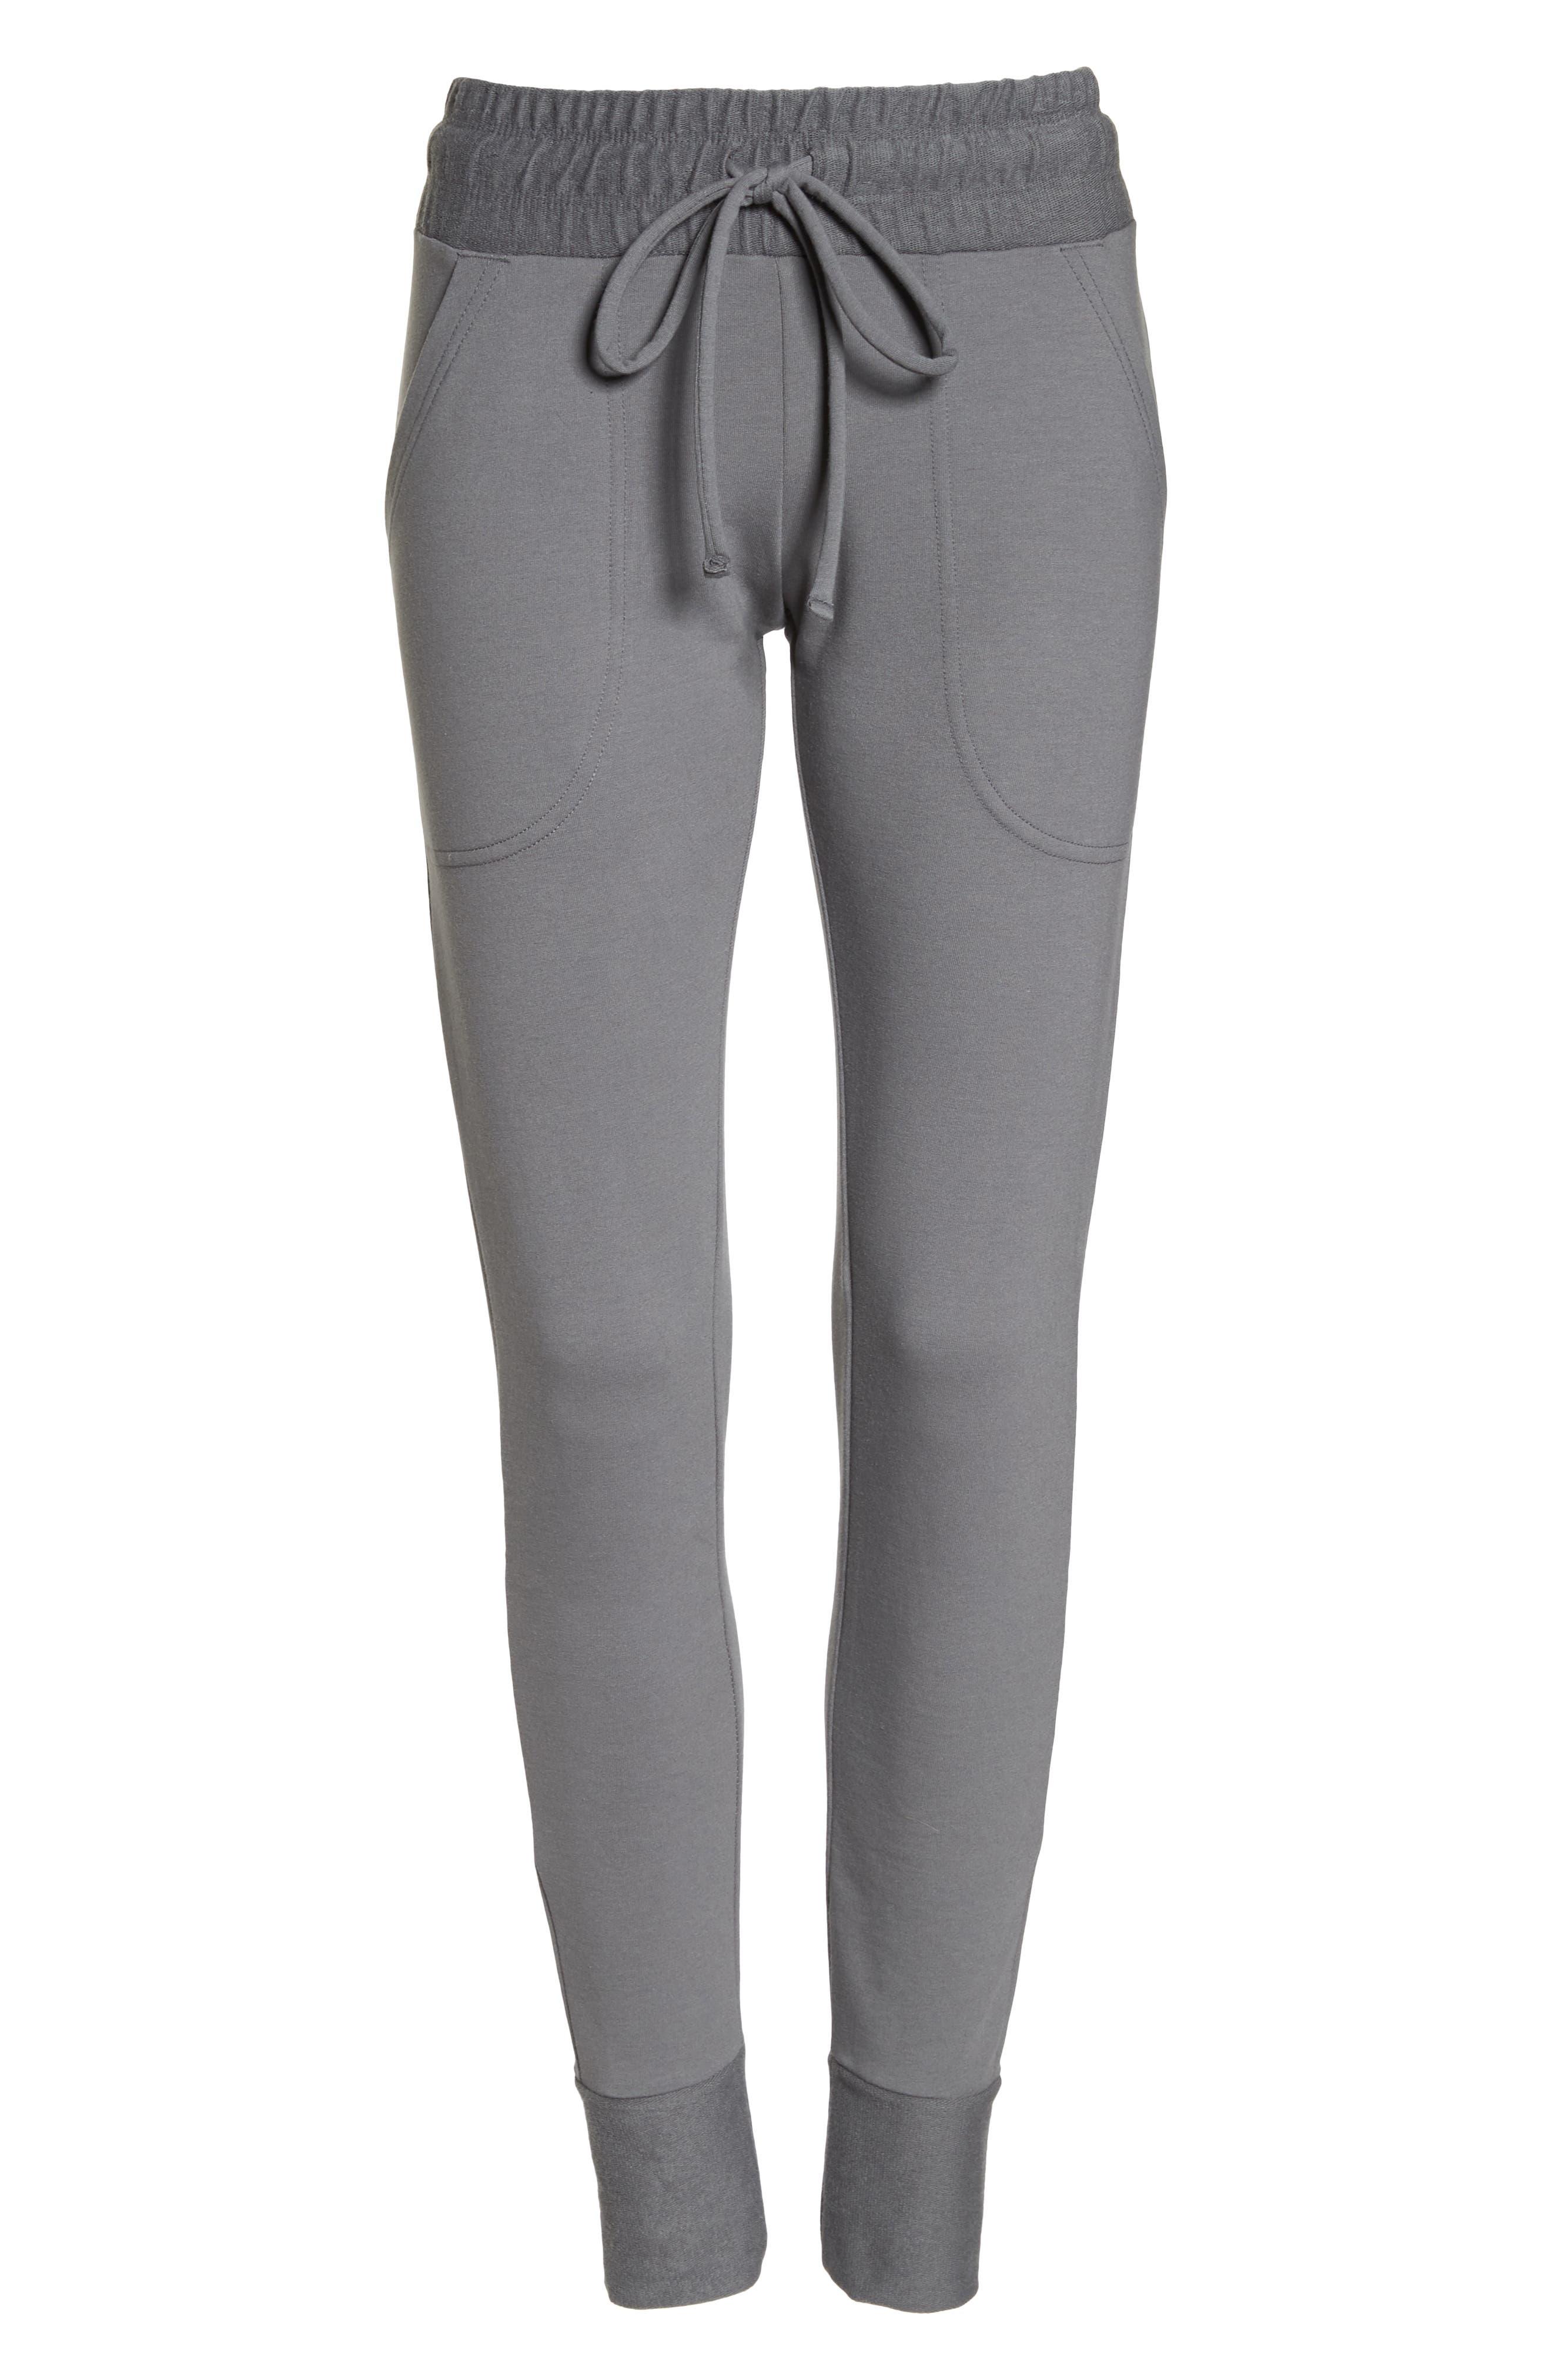 Sunny Skinny Sweatpants,                             Alternate thumbnail 7, color,                             Dark Grey